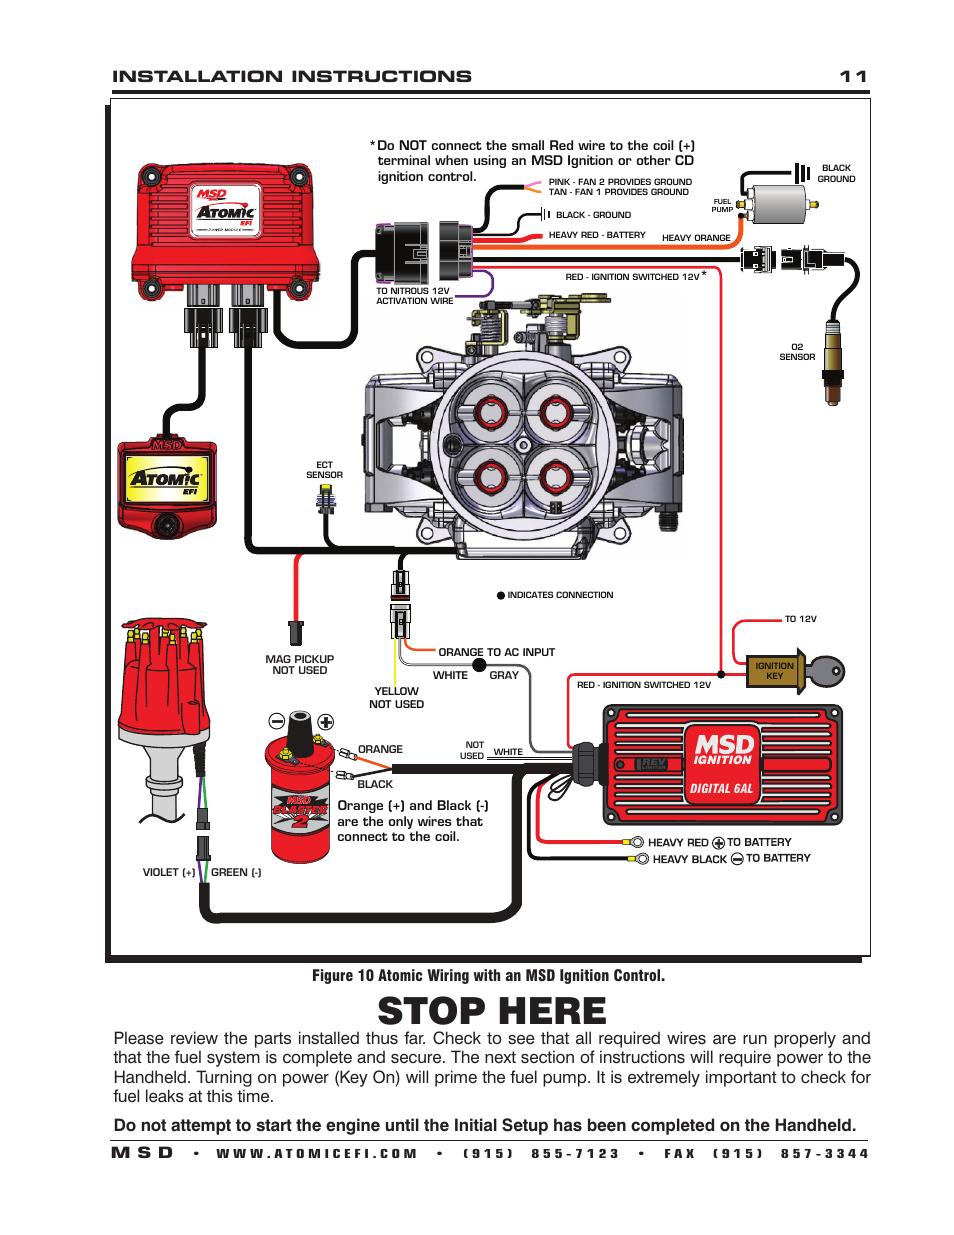 stop here installation instructions 11 m s d msd 2910 atomic efi rh manualsdir com